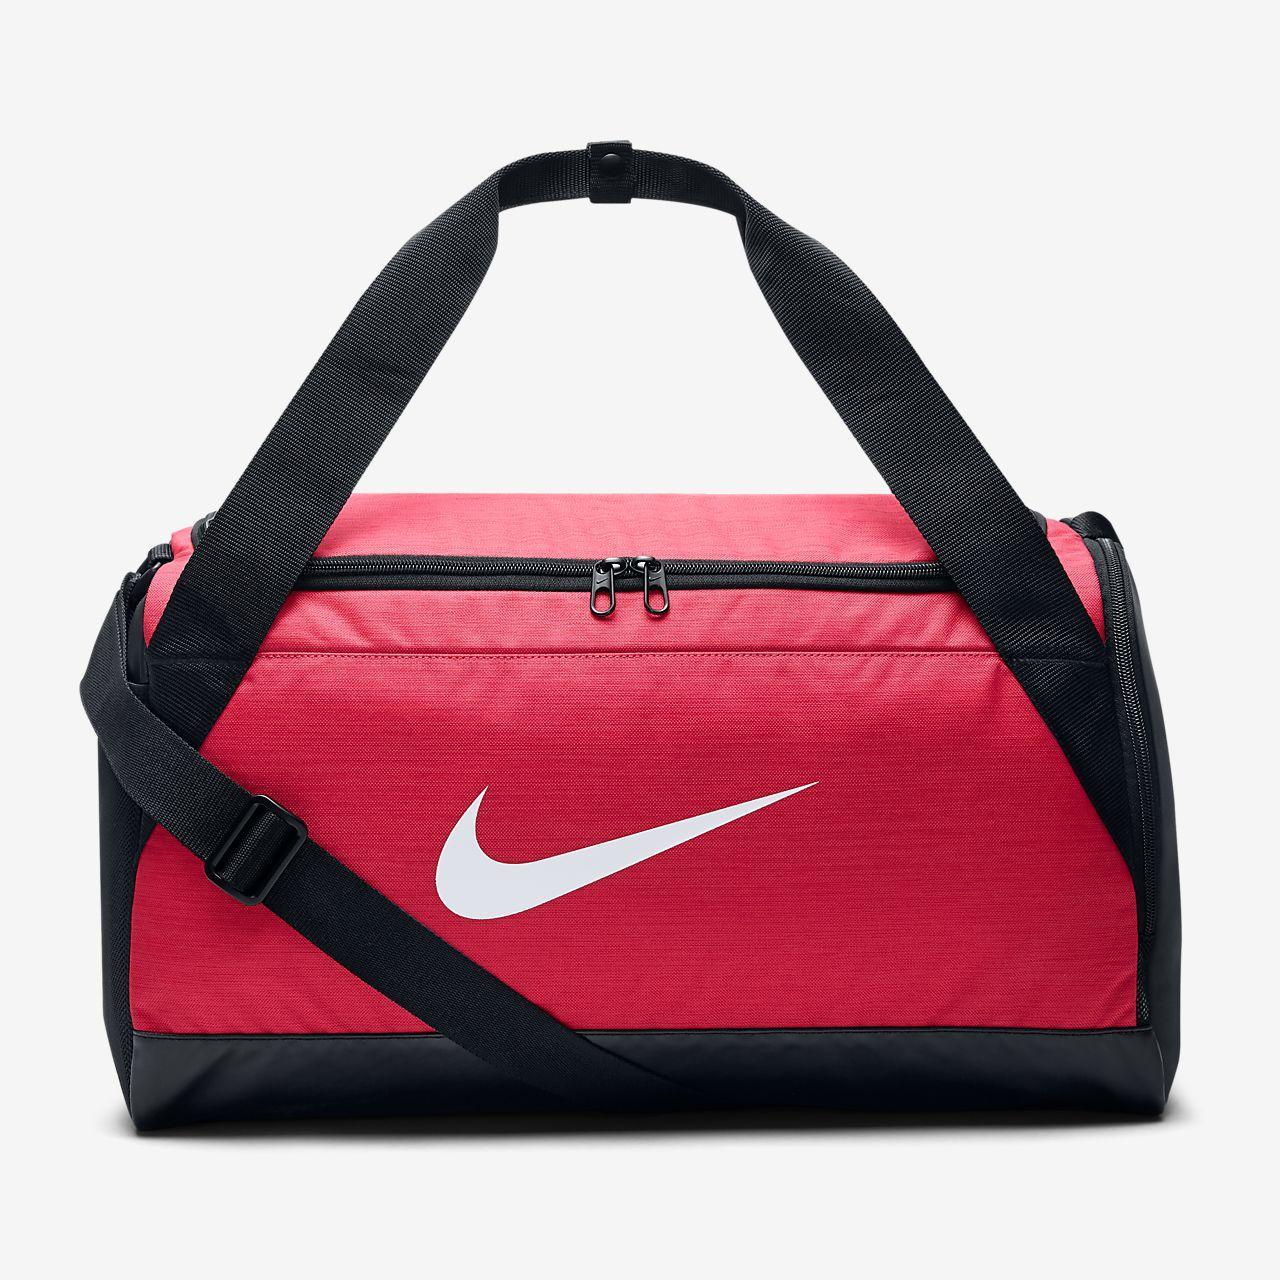 6c7a7842f40b Спортивная сумка Nike Brazilia Duffel BA5335-064 S 40 л (original) маленькая  мужская